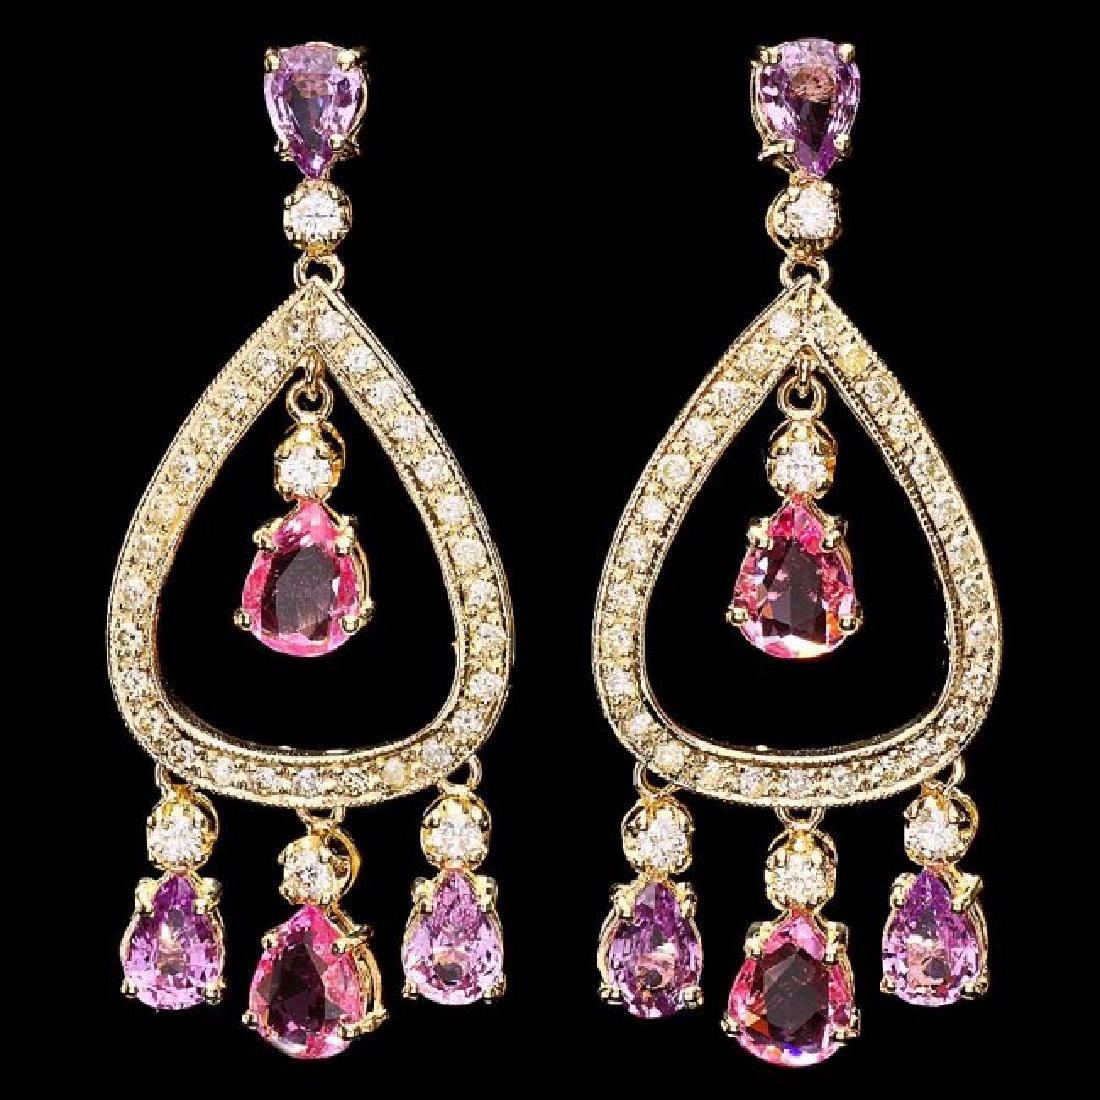 14k Gold 8ct Sapphire 1.70ct Diamond Earrings